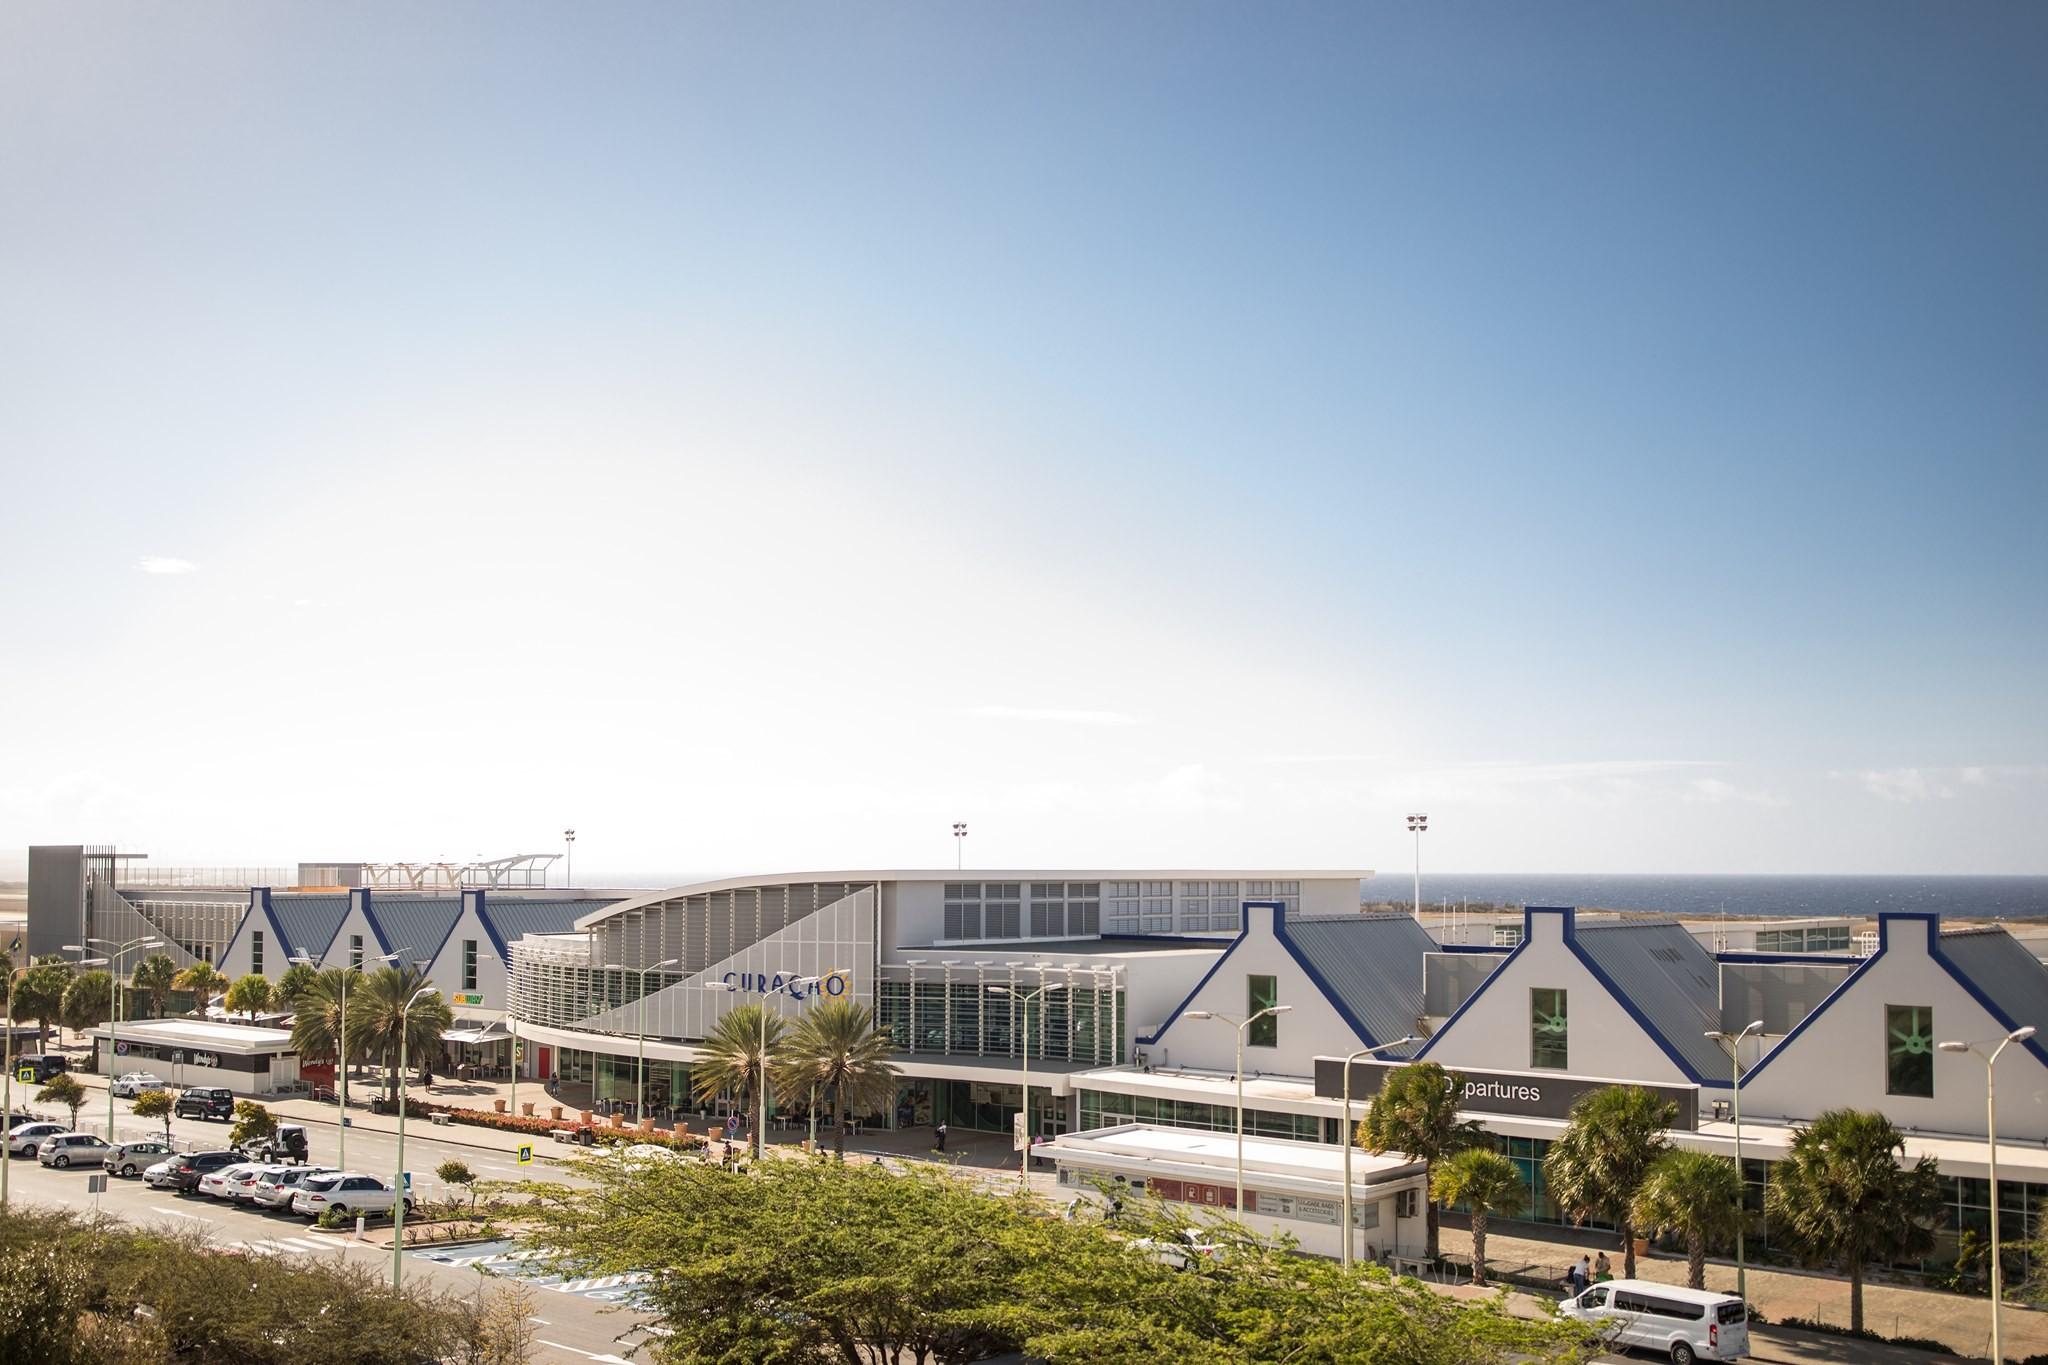 Curacao Airport Partners (CAP) | LinkedIn